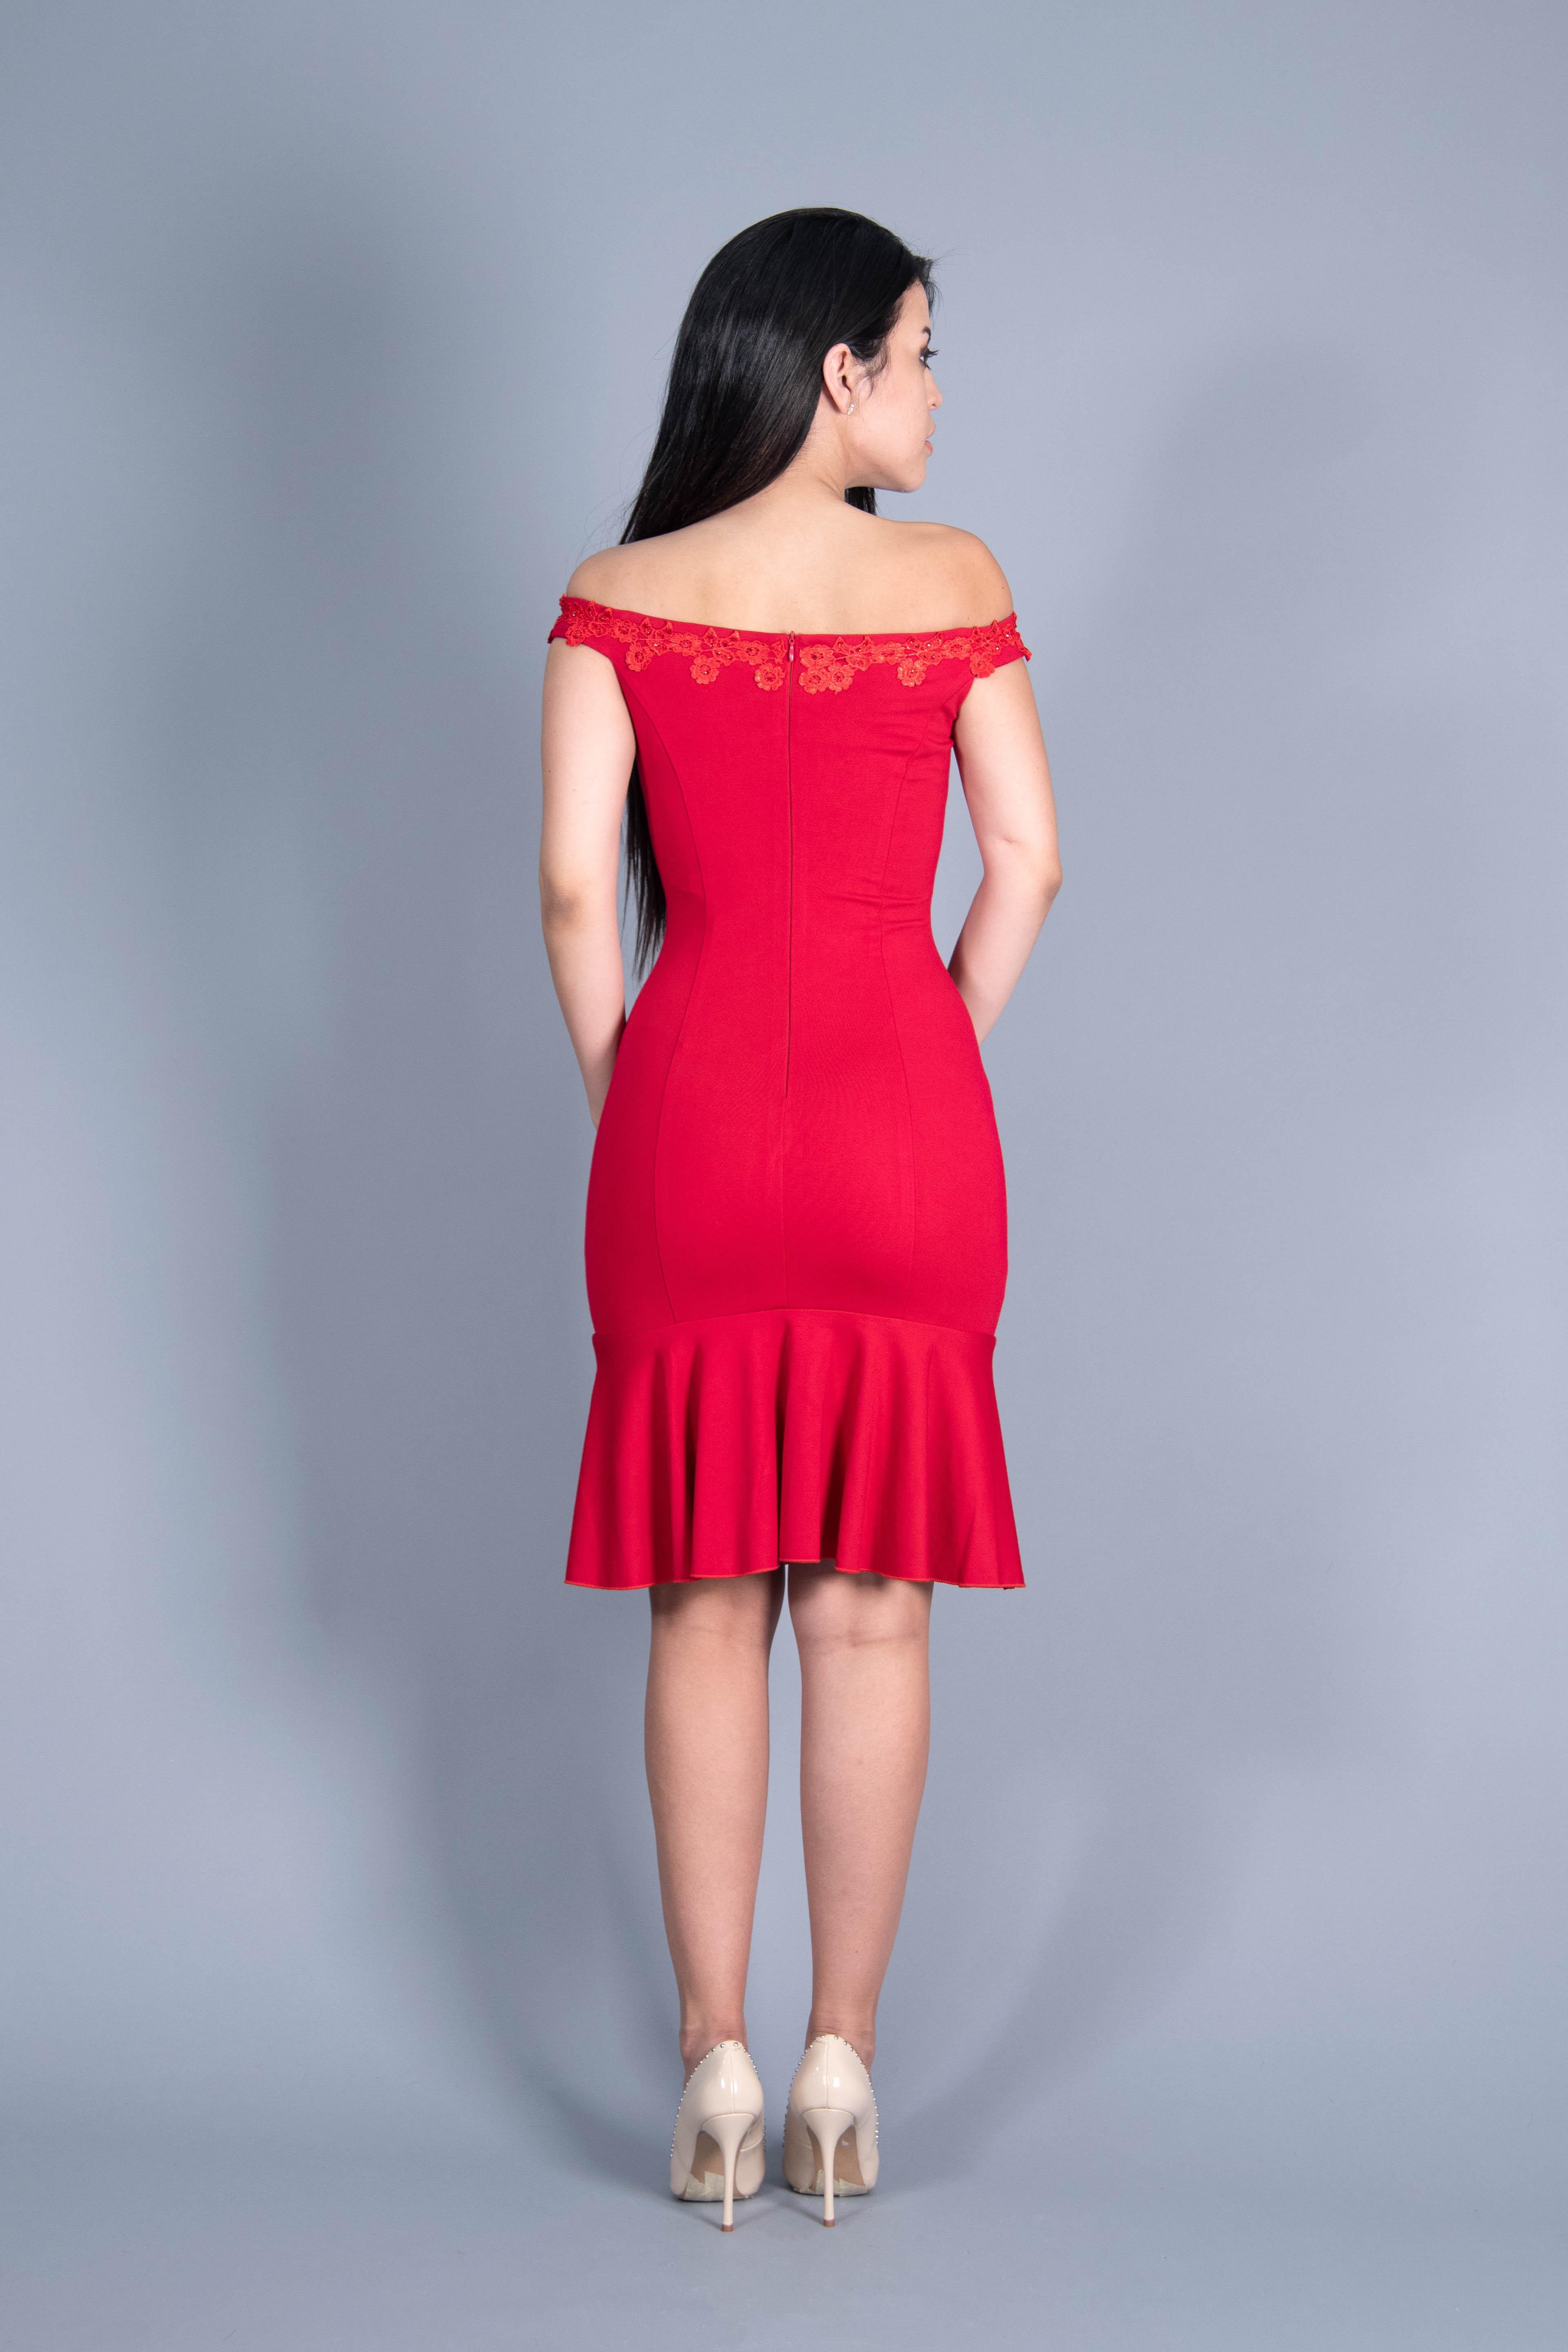 Vestido Cherry